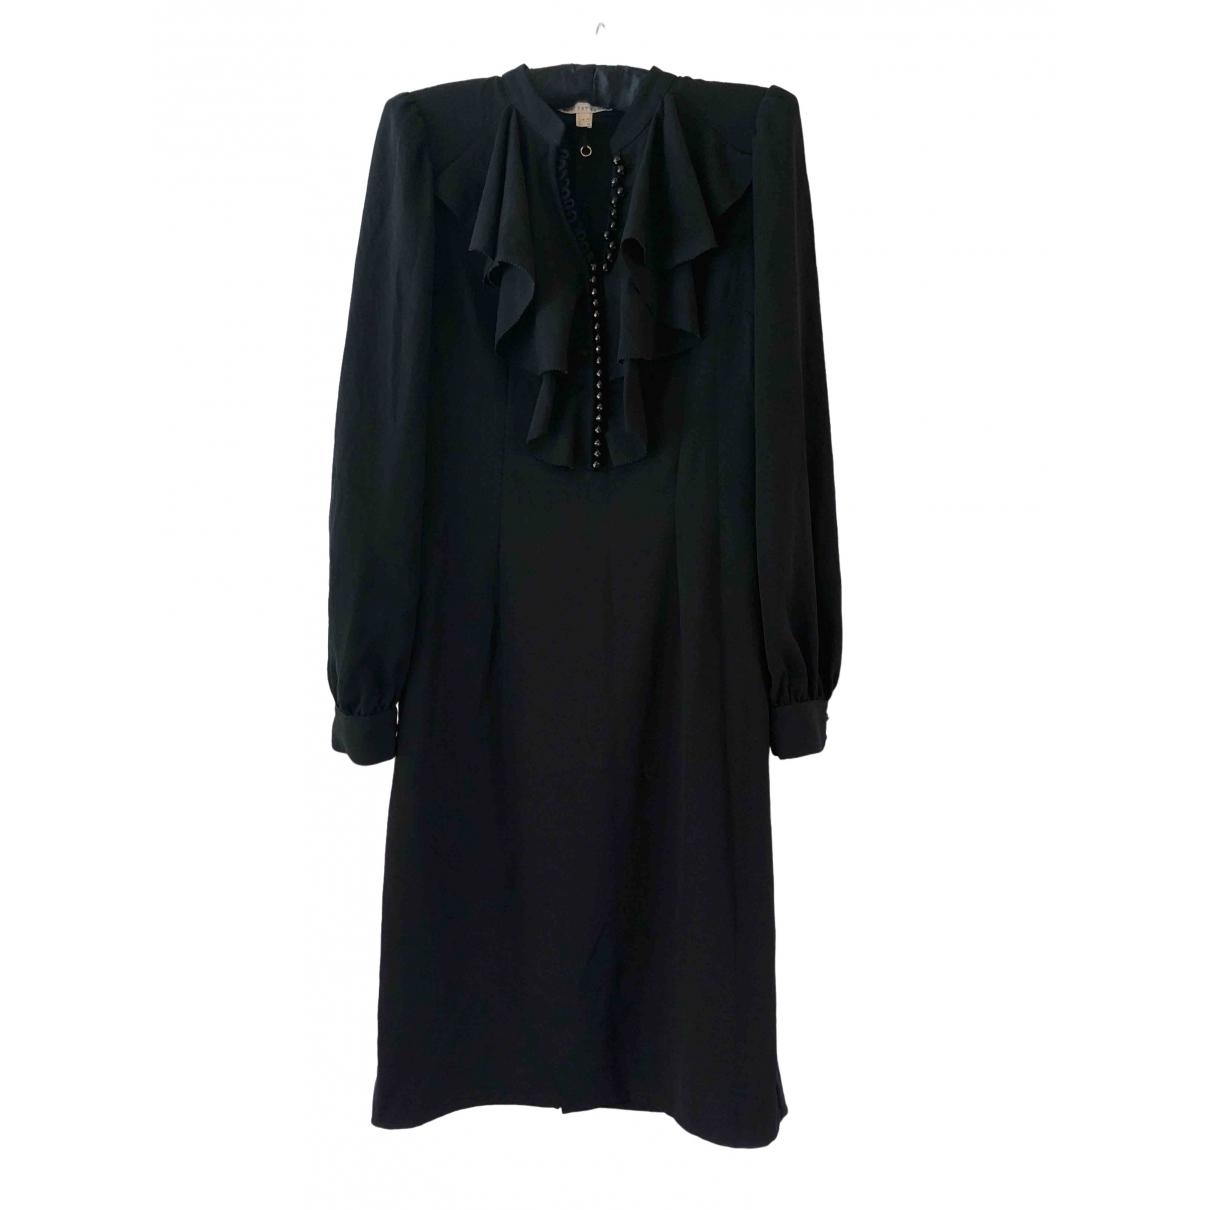 Twenty8twelve By S.miller \N Black dress for Women 10 UK